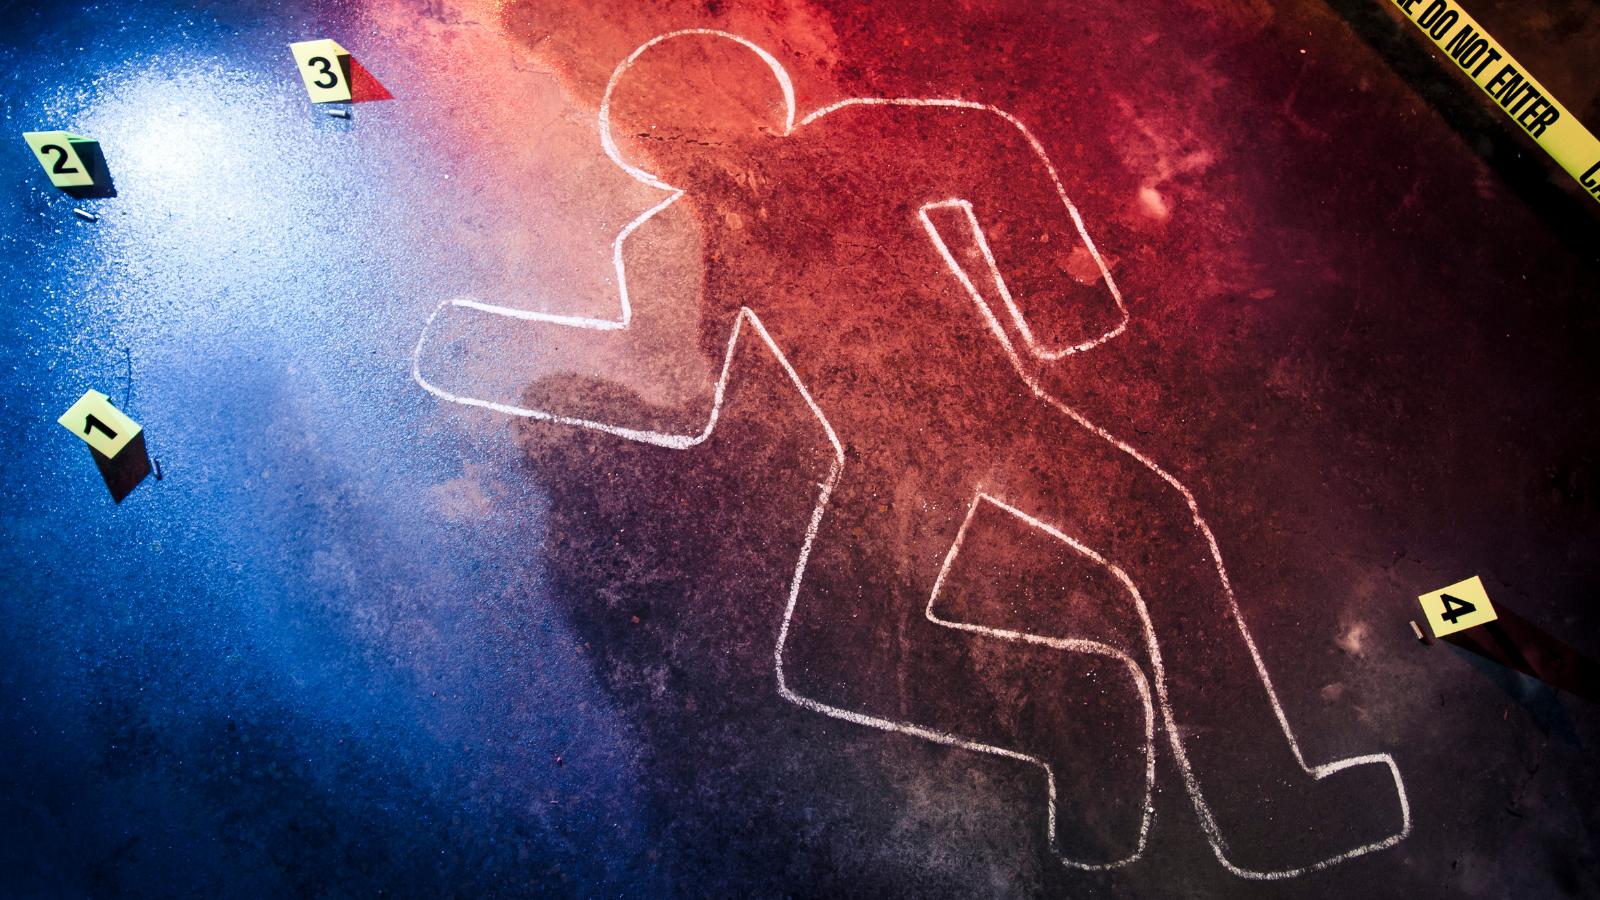 Pelaku Pembunuhan Pria Dalam Kamar Tertangkap